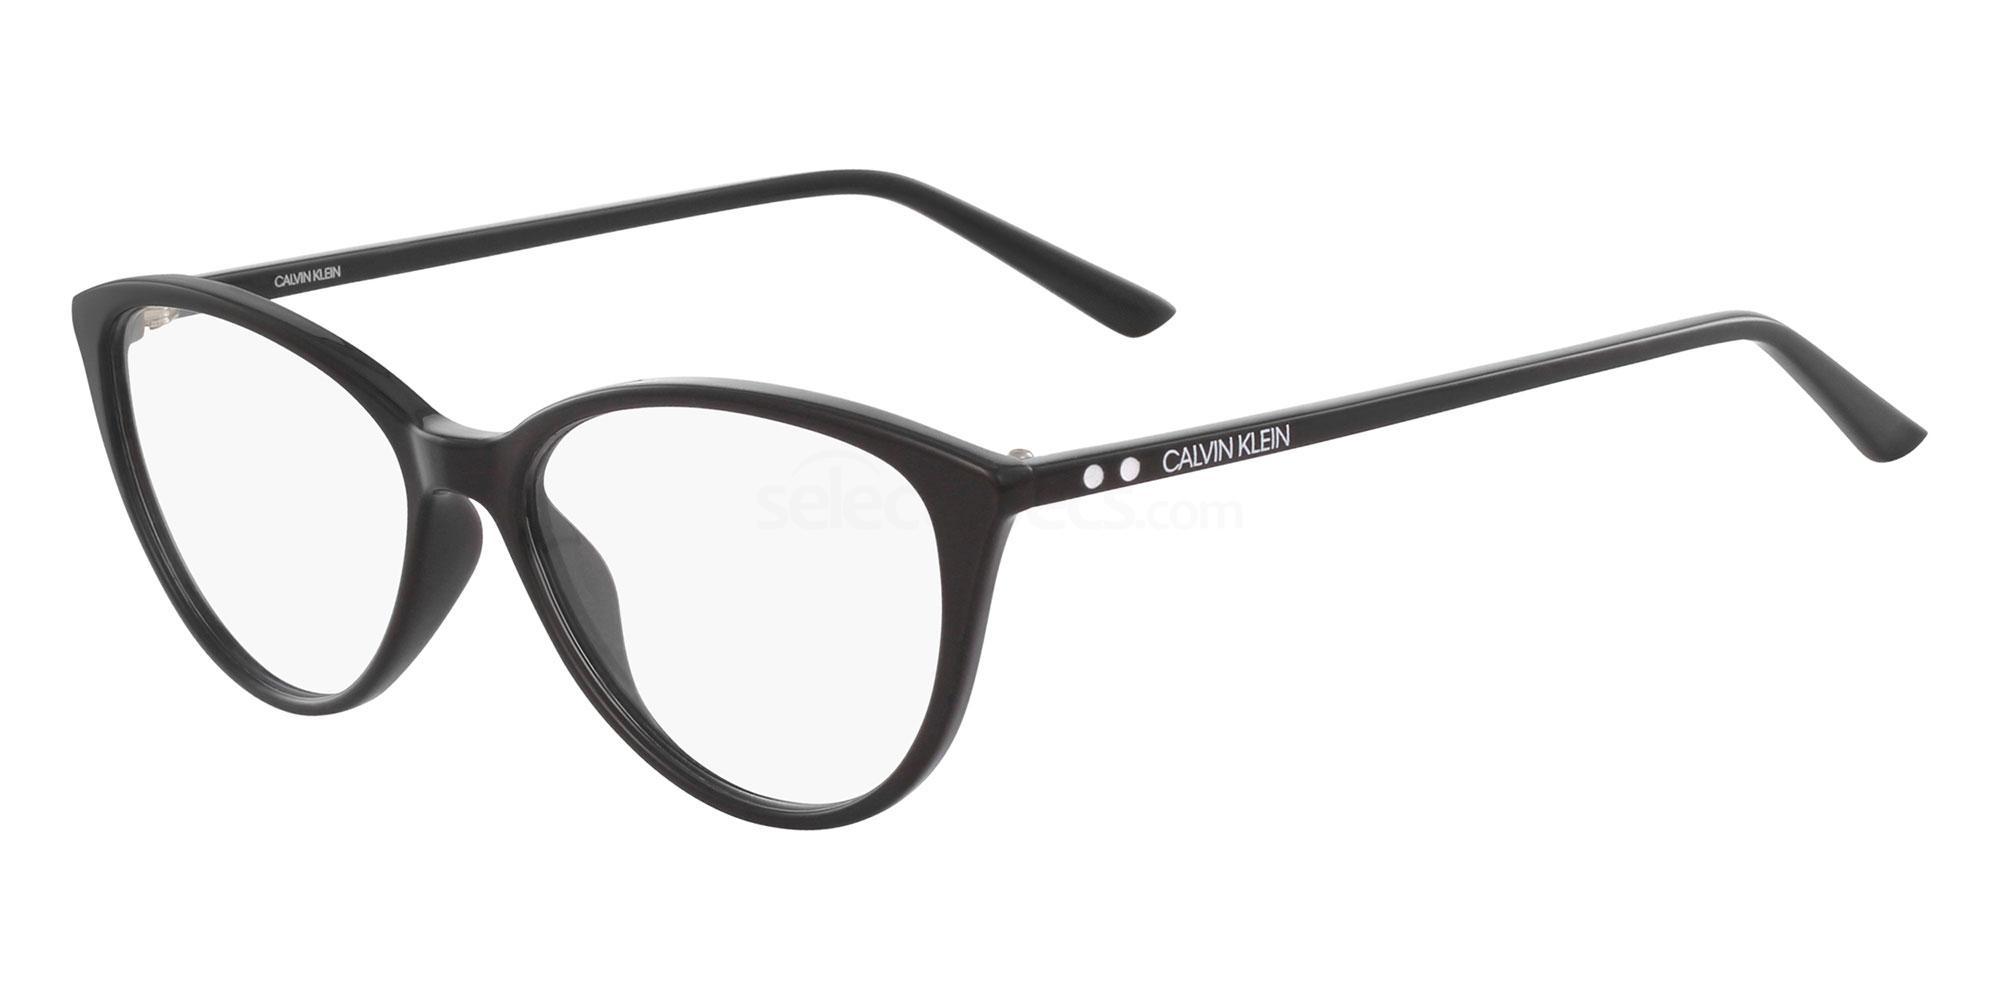 001 CK18543 Glasses, Calvin Klein